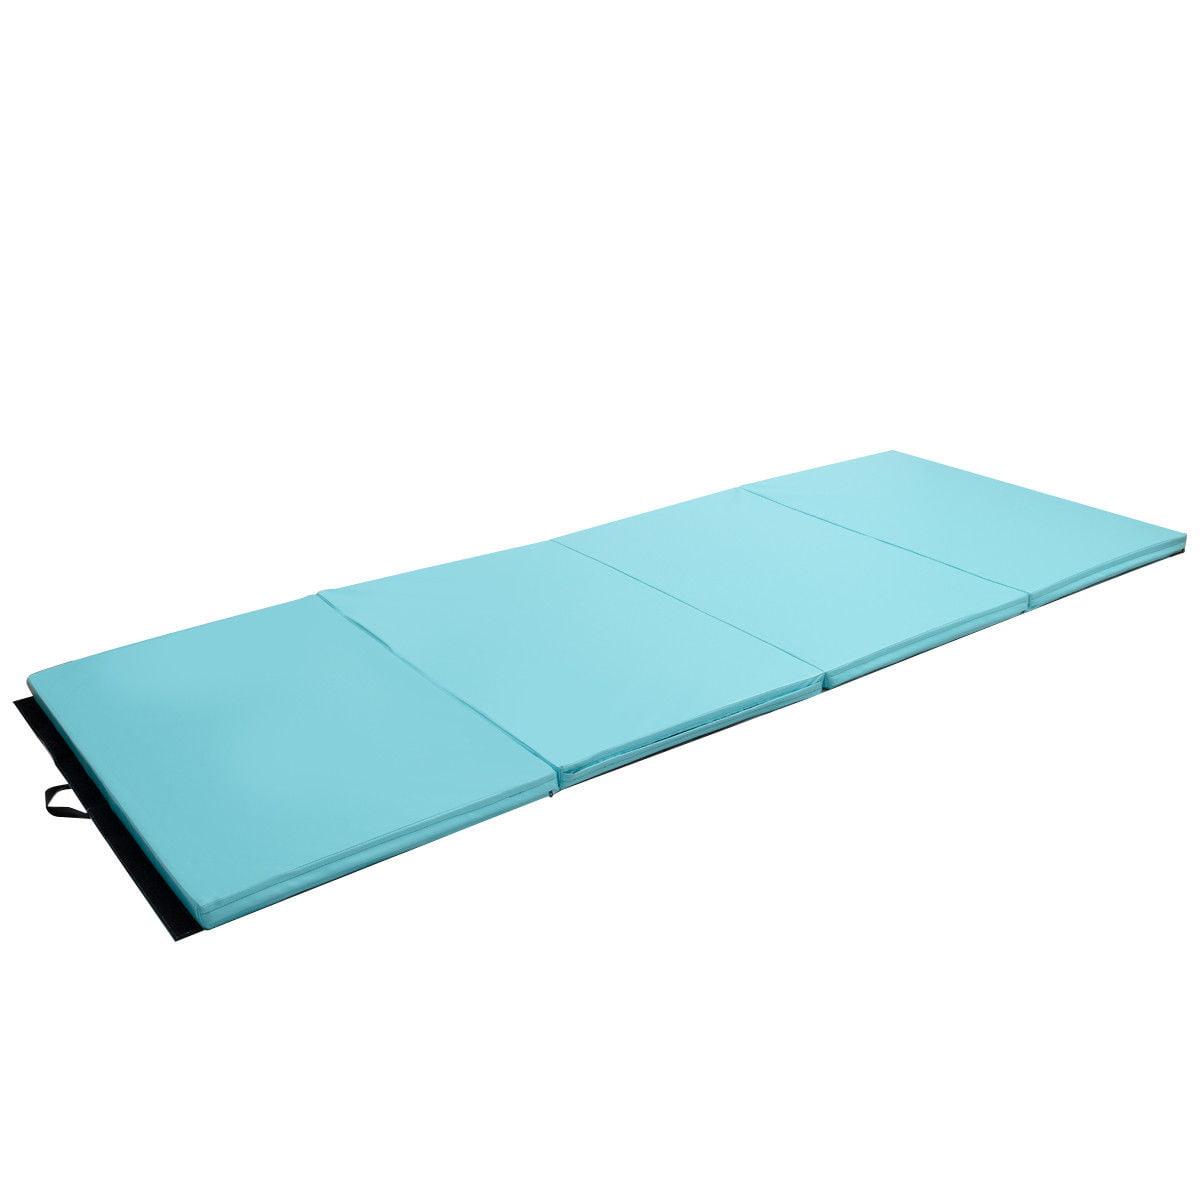 "4'x10'x2"" Gymnastics Mat Thick Folding Panel Aerobics Exercise Gym Fitness Blue - image 1 de 8"